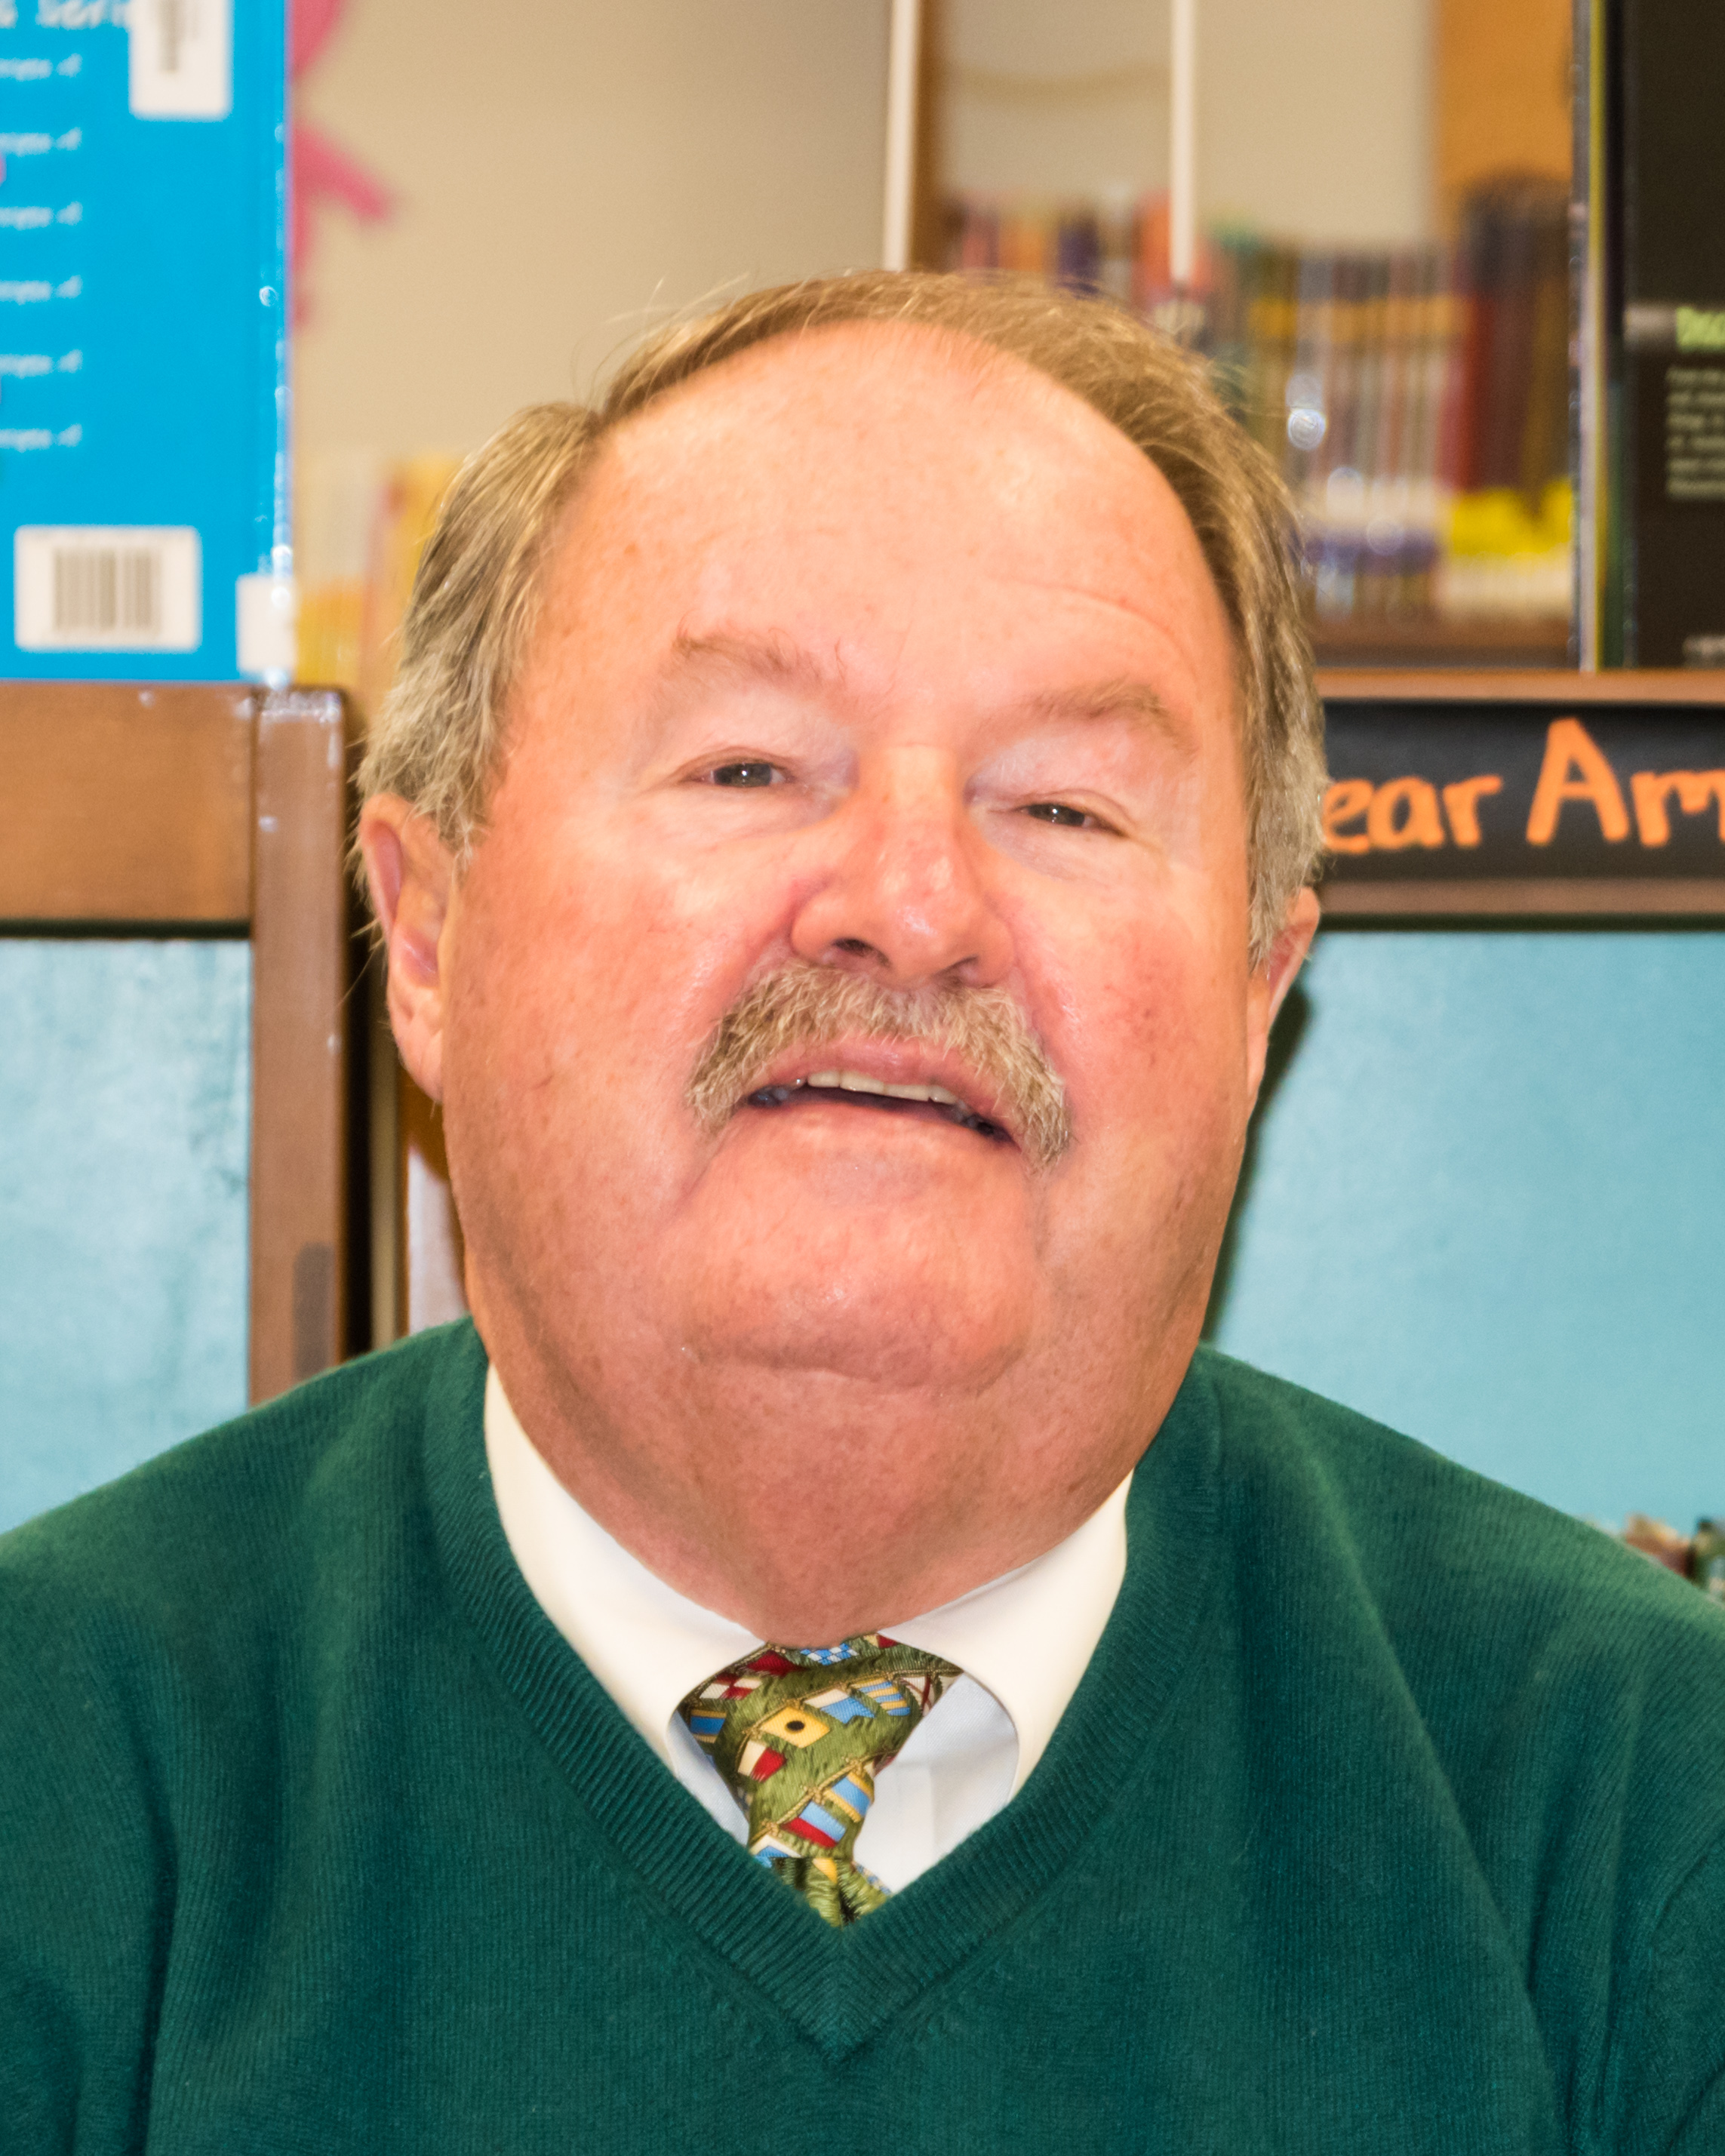 Mr. Paul A. Dunfee